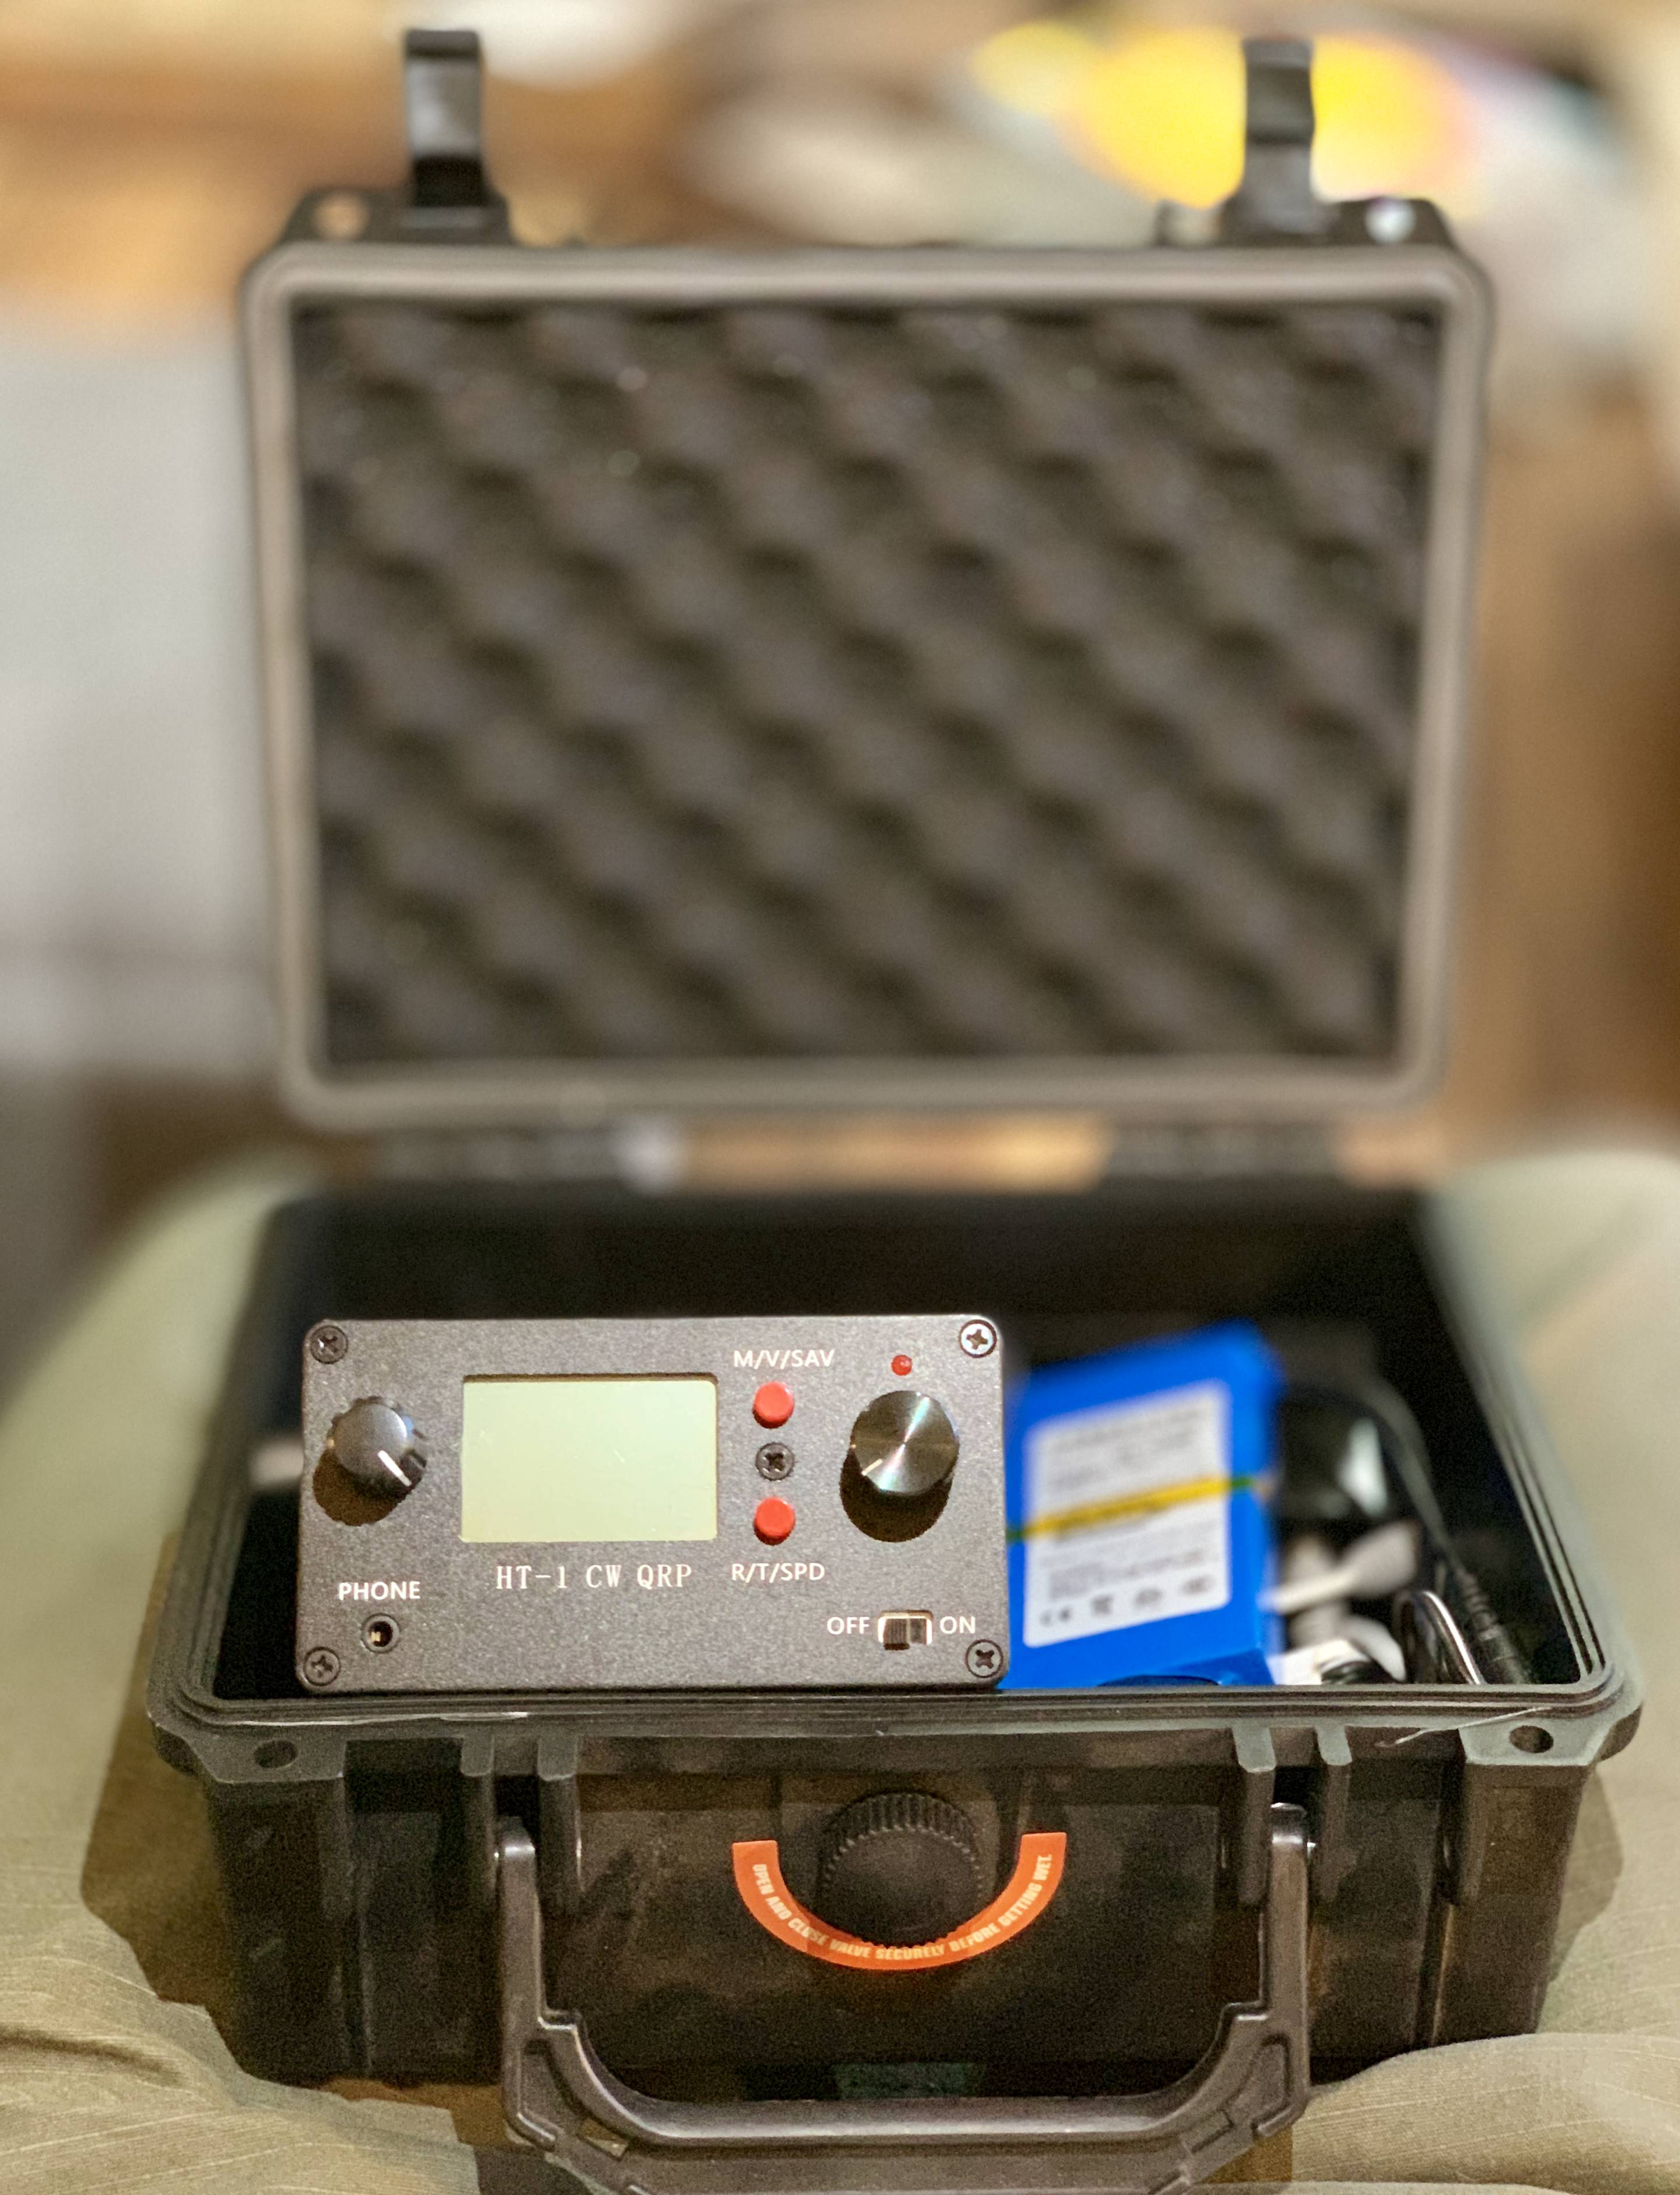 HT-1A Dual Band CW QRP Ham Radio Transceiver – The Tech Examiner